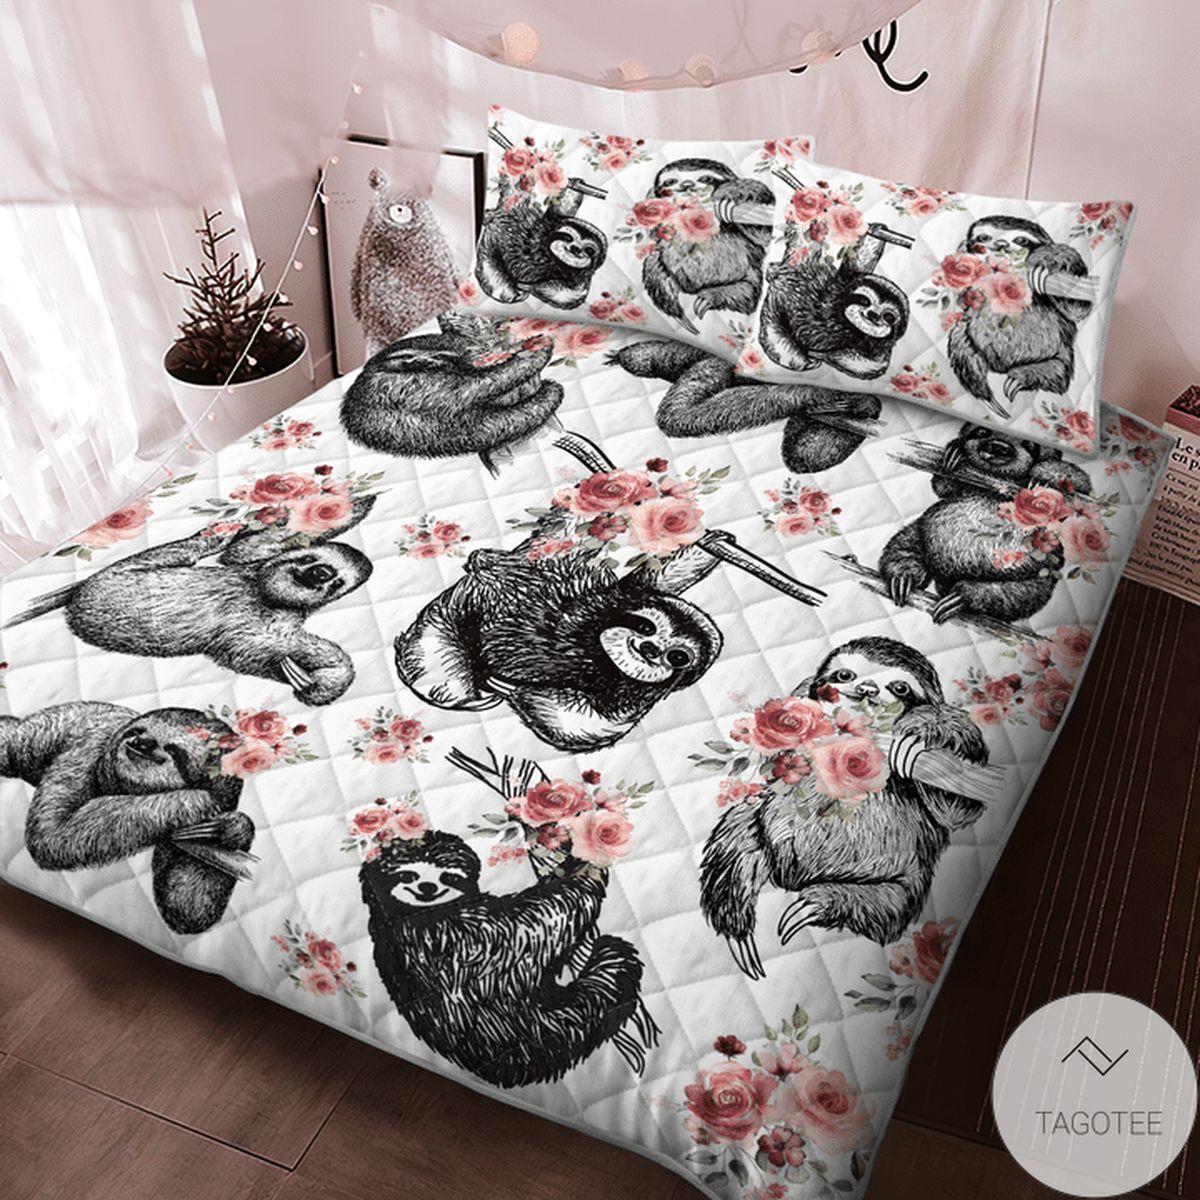 Print On Demand Sloth Flower Quilt Bedding Set